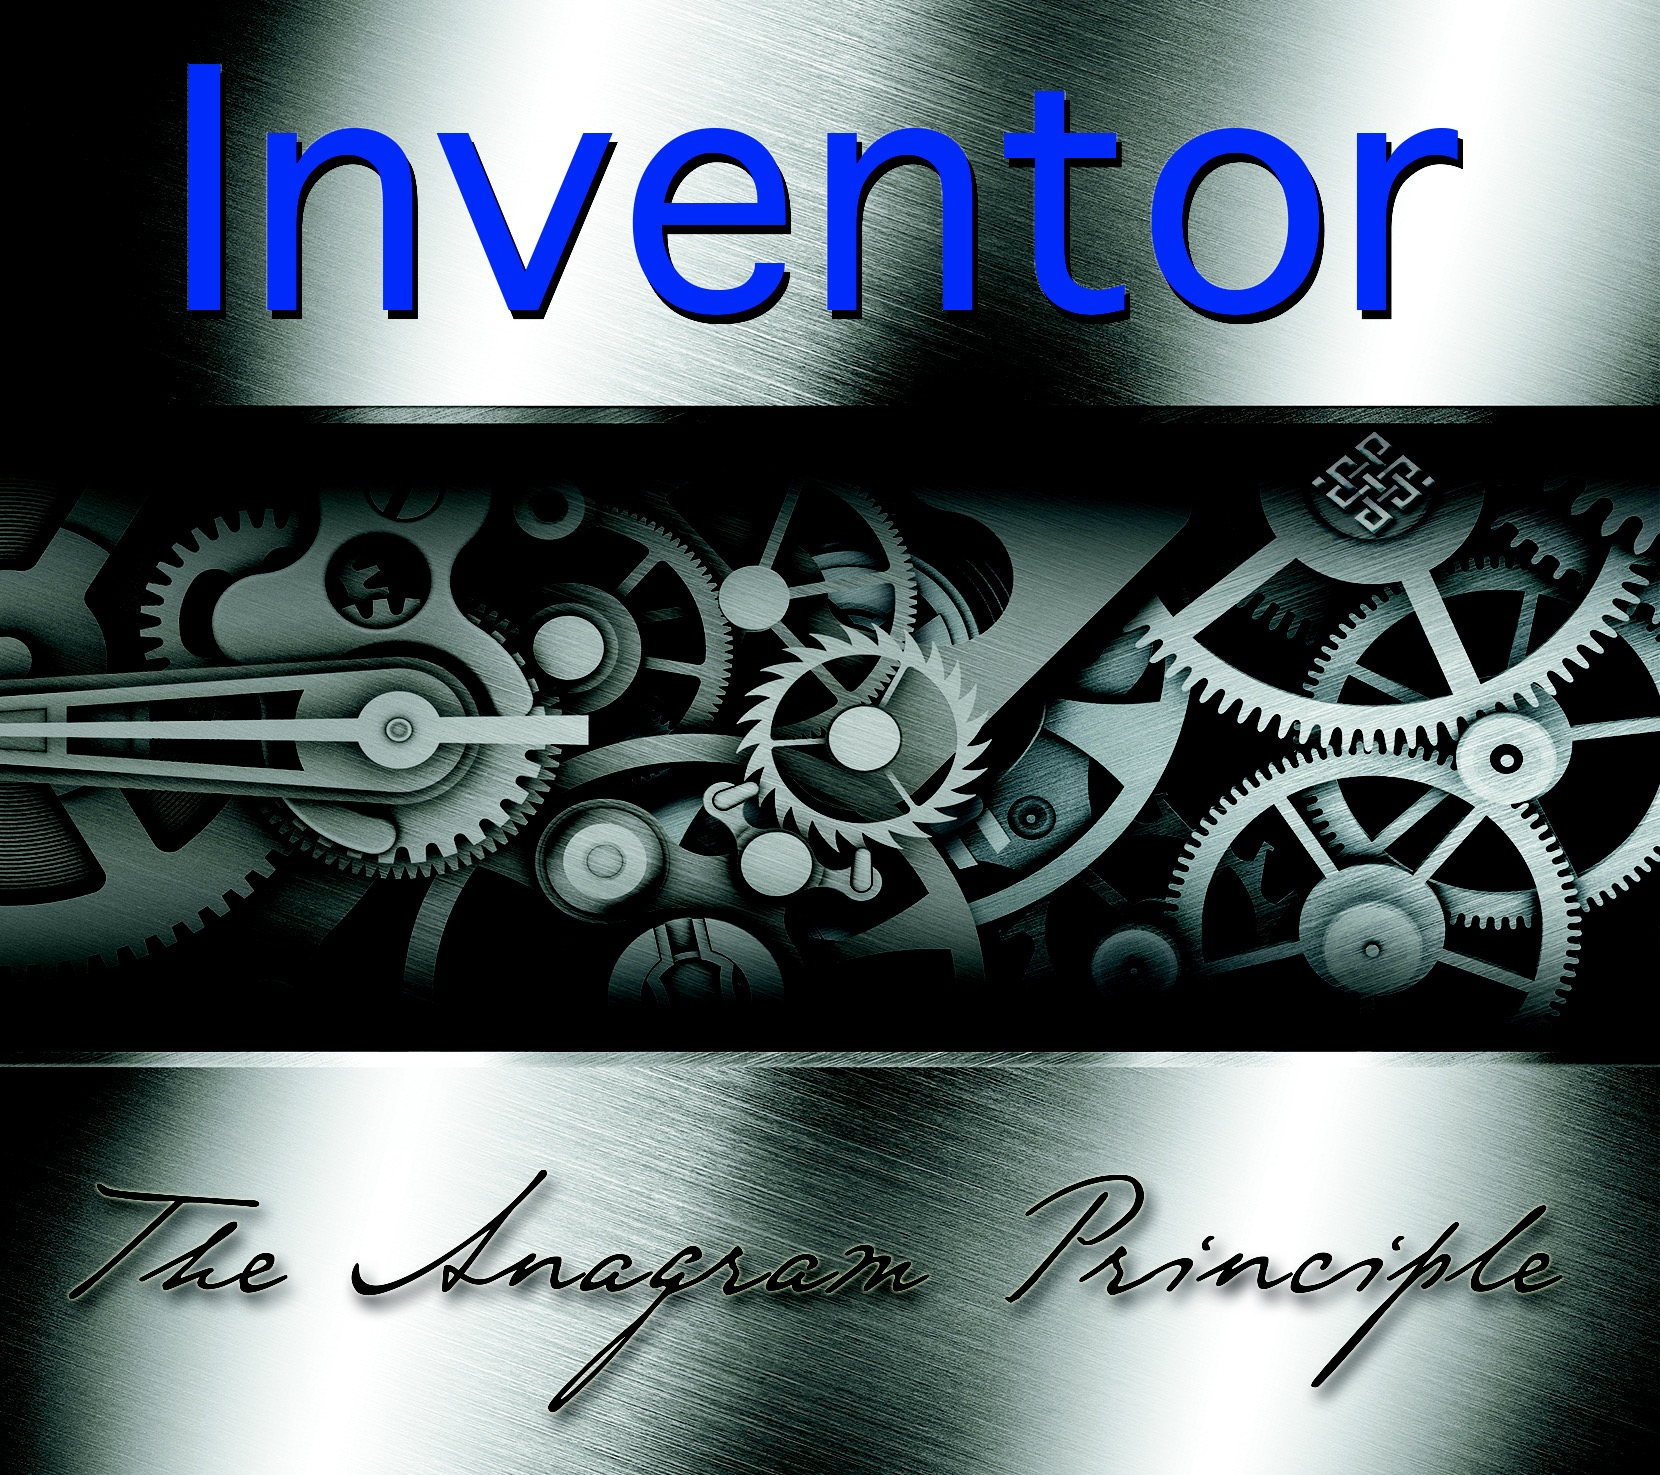 The Anagram Principle: Inventor